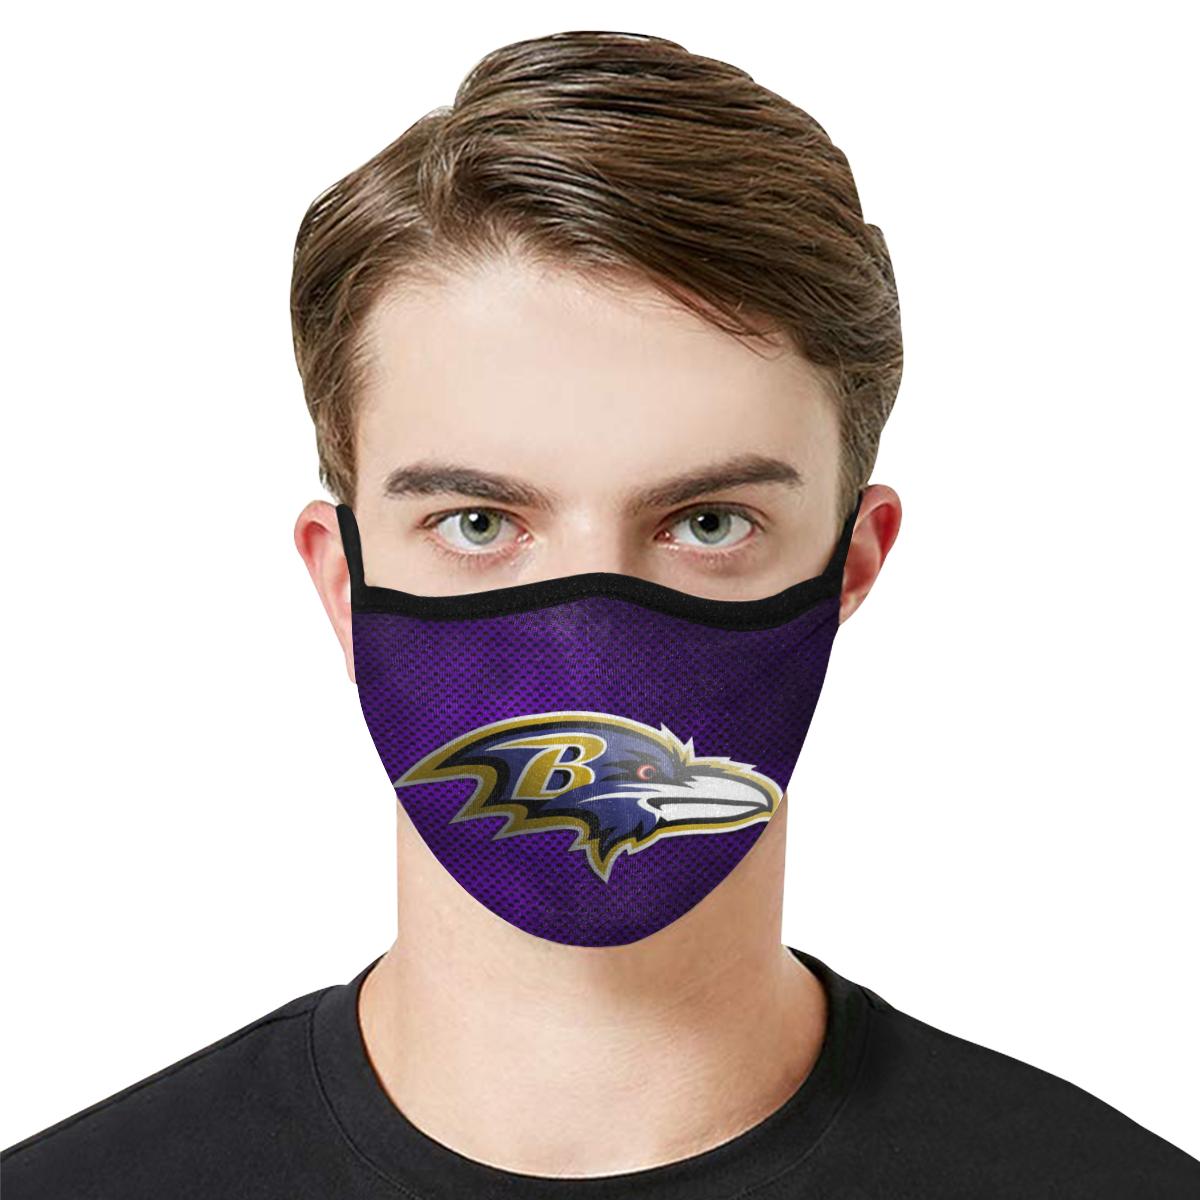 Baltimore Ravens Face Mask PM2.5